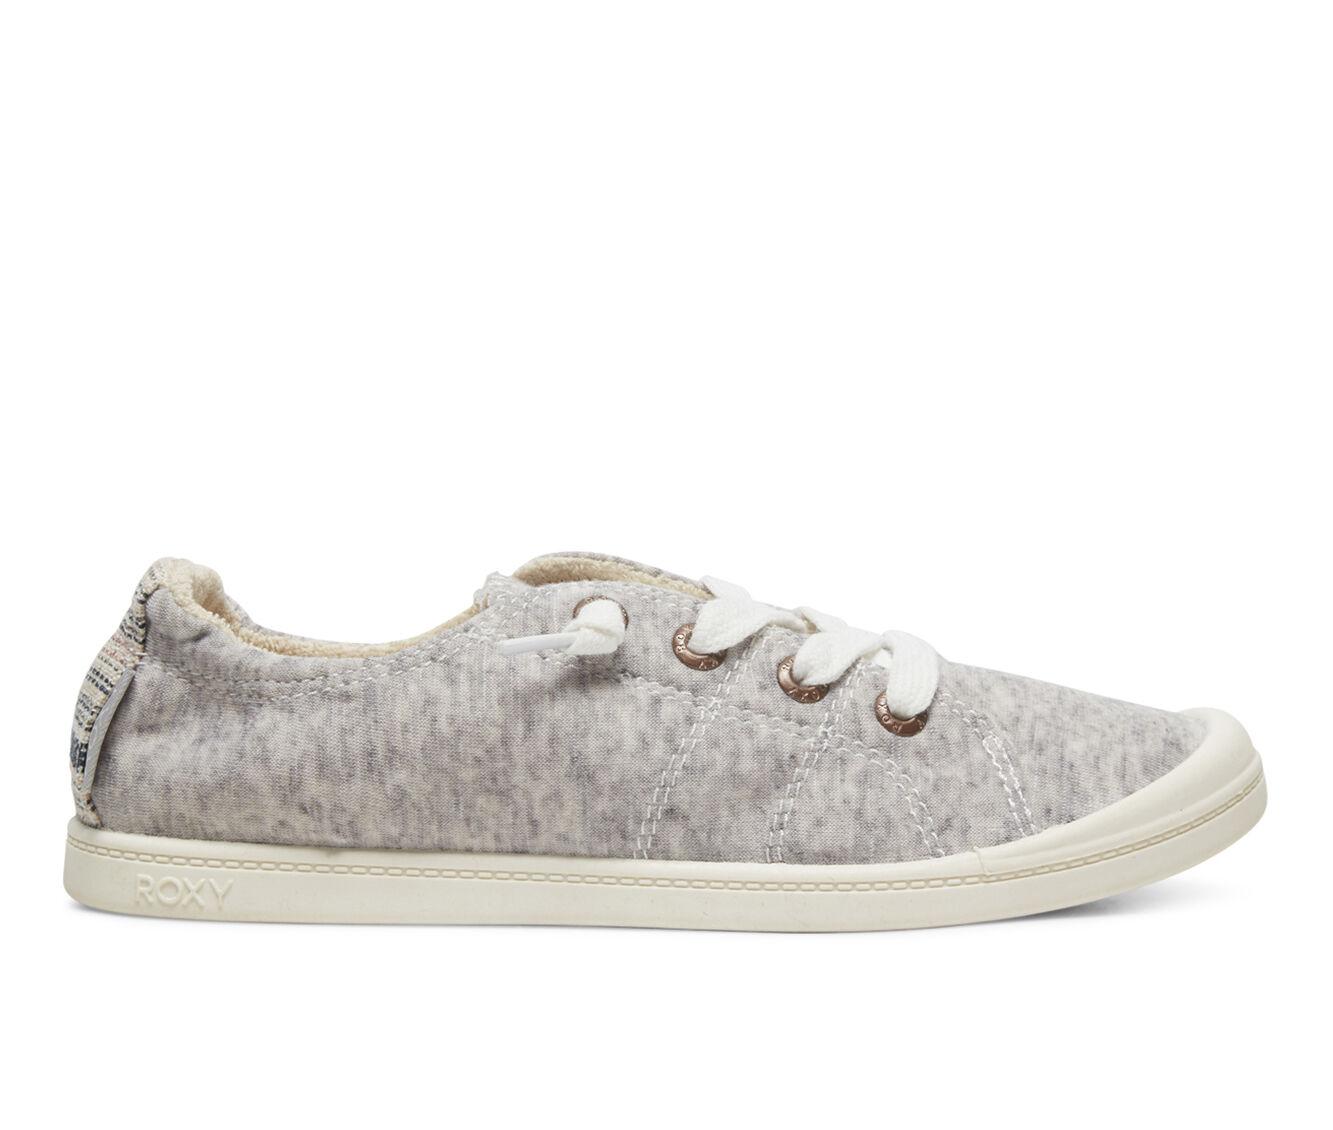 Women's Roxy Bayshore Sneakers Heather Grey